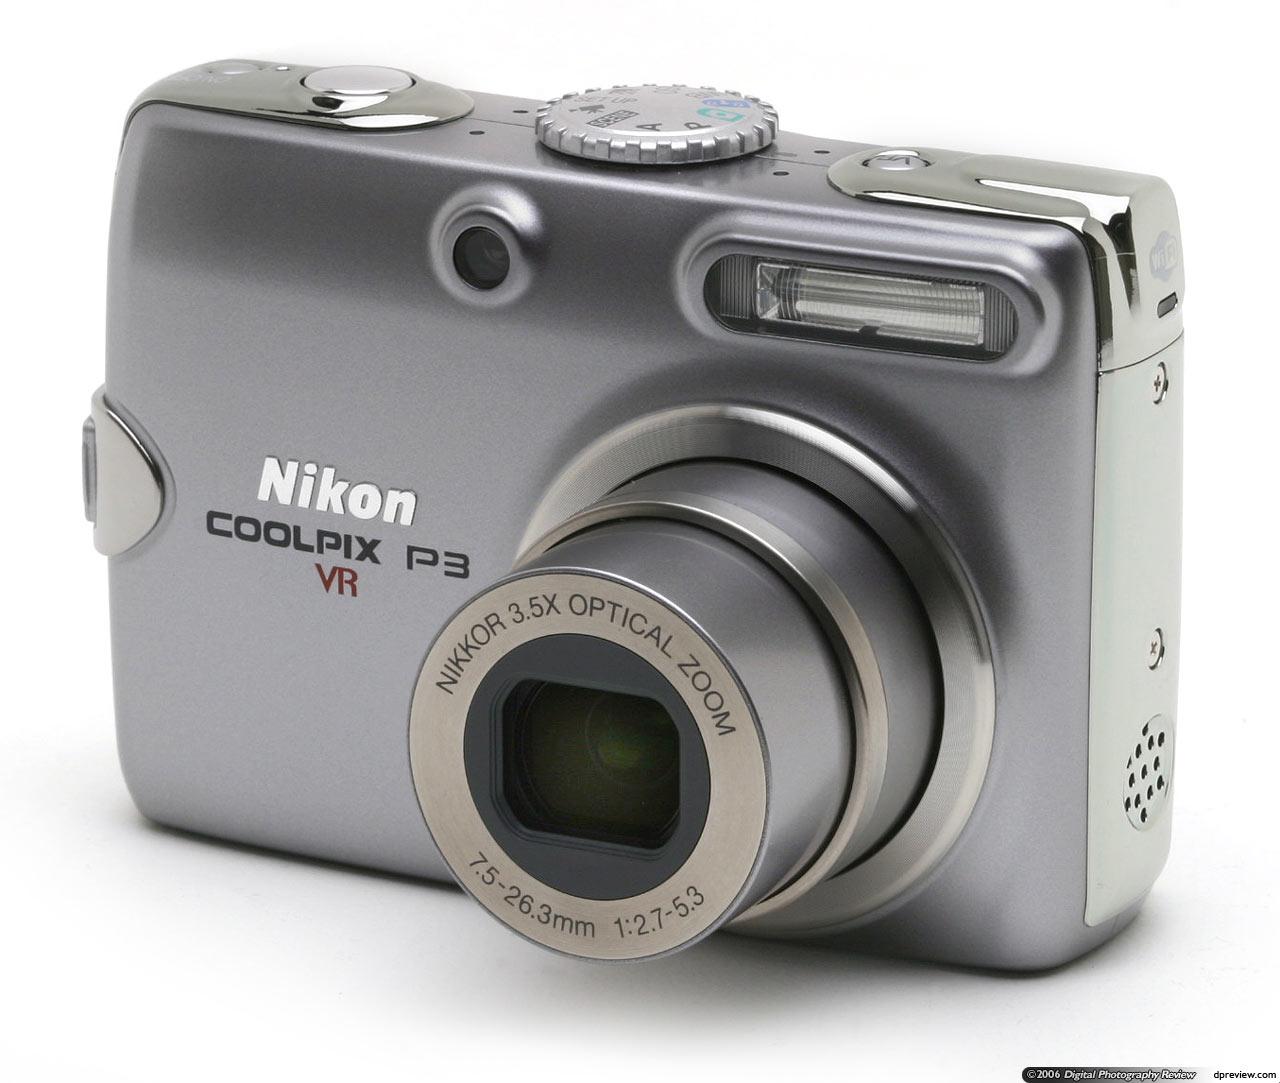 nikon coolpix p3 concise review digital photography review rh dpreview com Nikon Camera User Manual Nikon Coolpix S3000 Manual